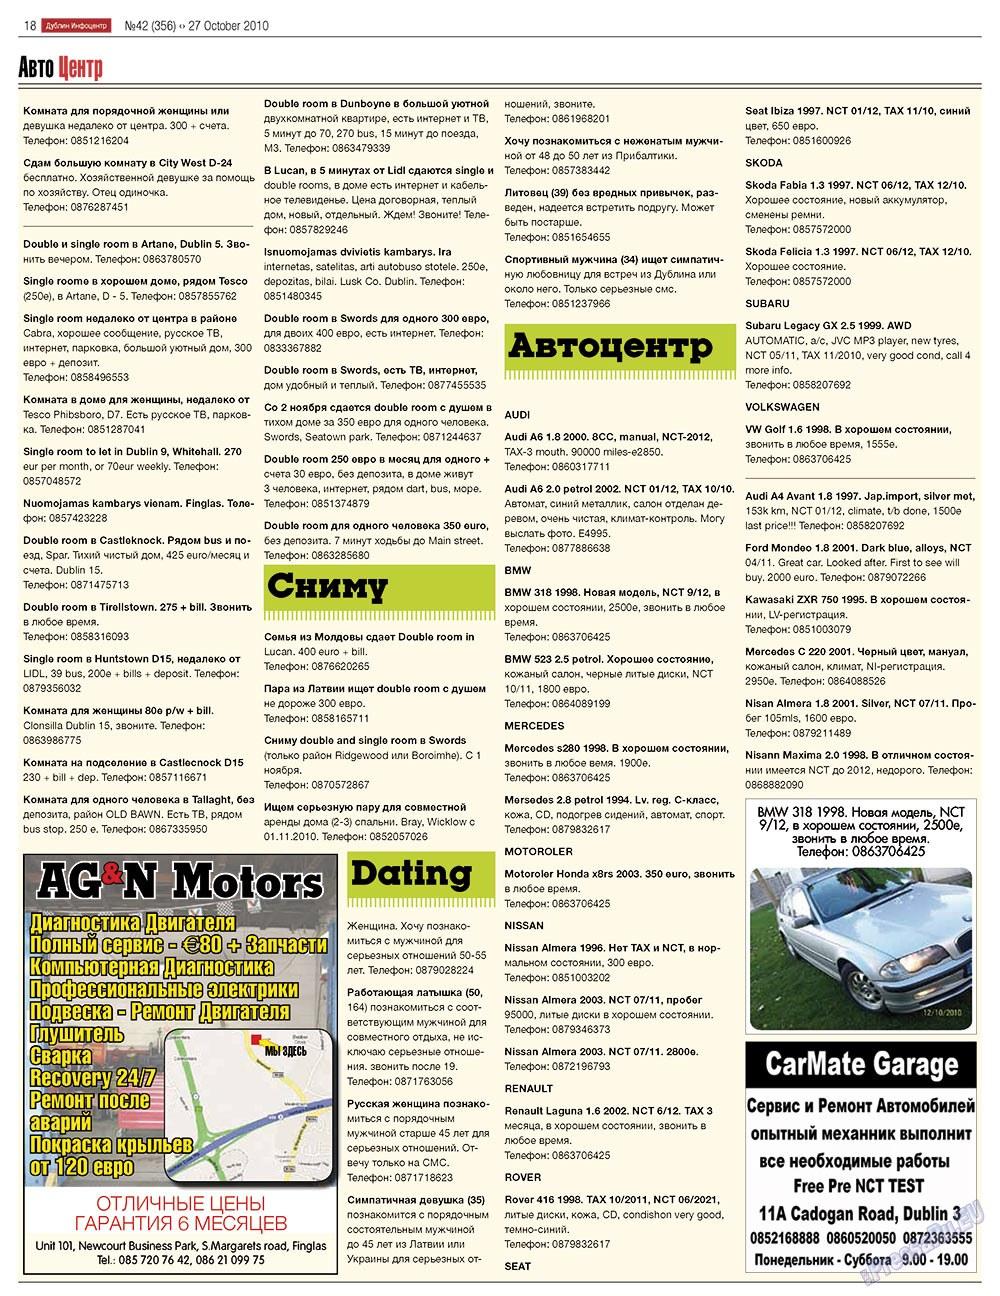 Дублин инфоцентр (газета). 2010 год, номер 42, стр. 18